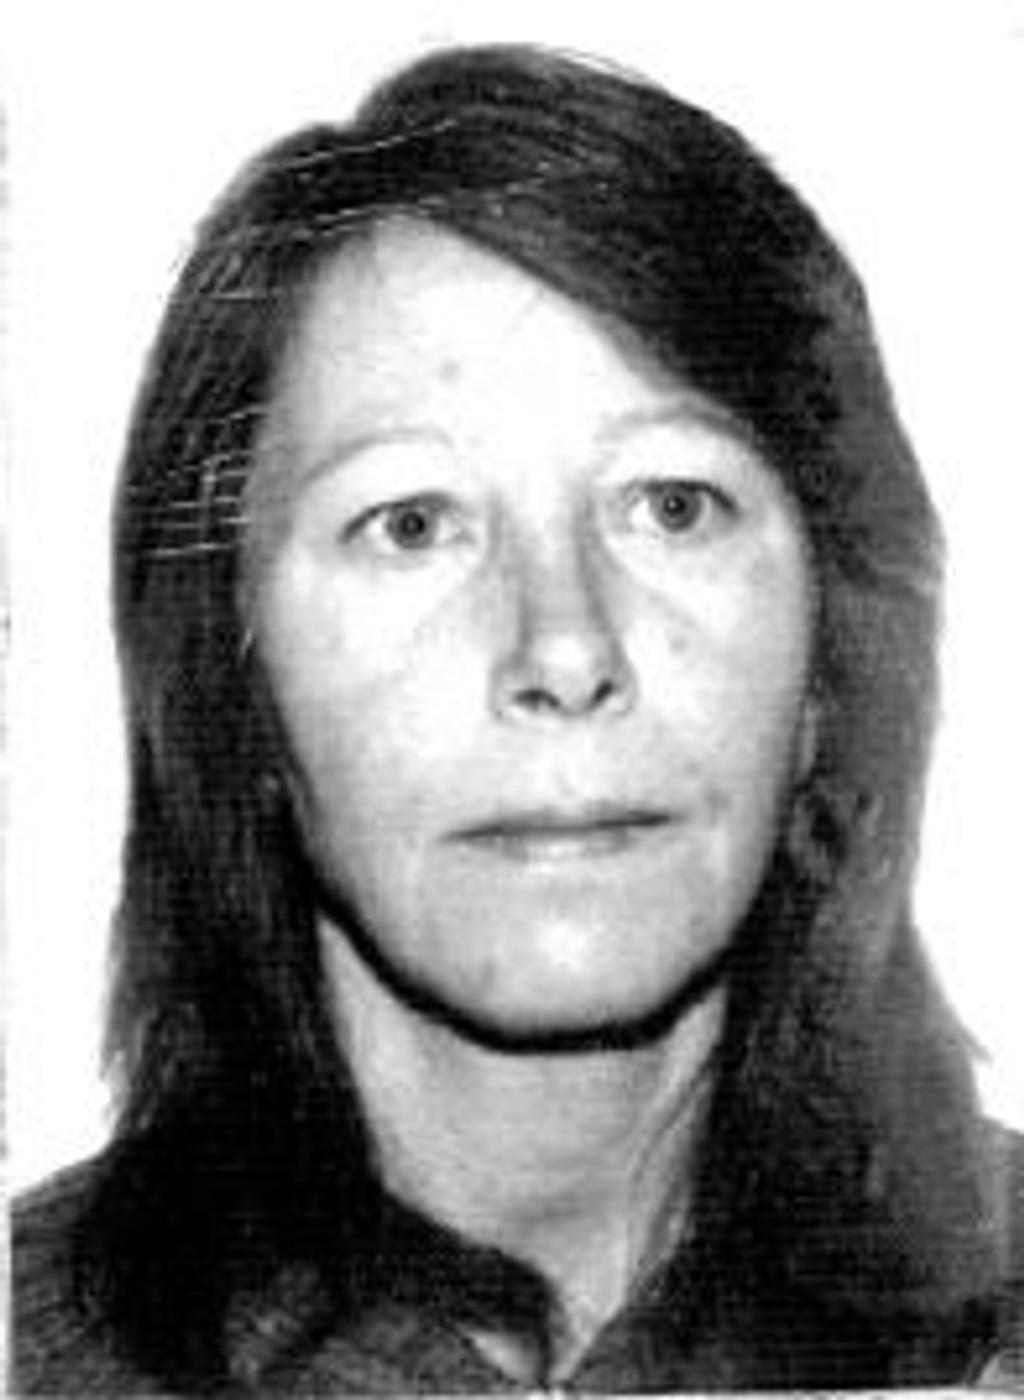 Sissel Karin Gugarden